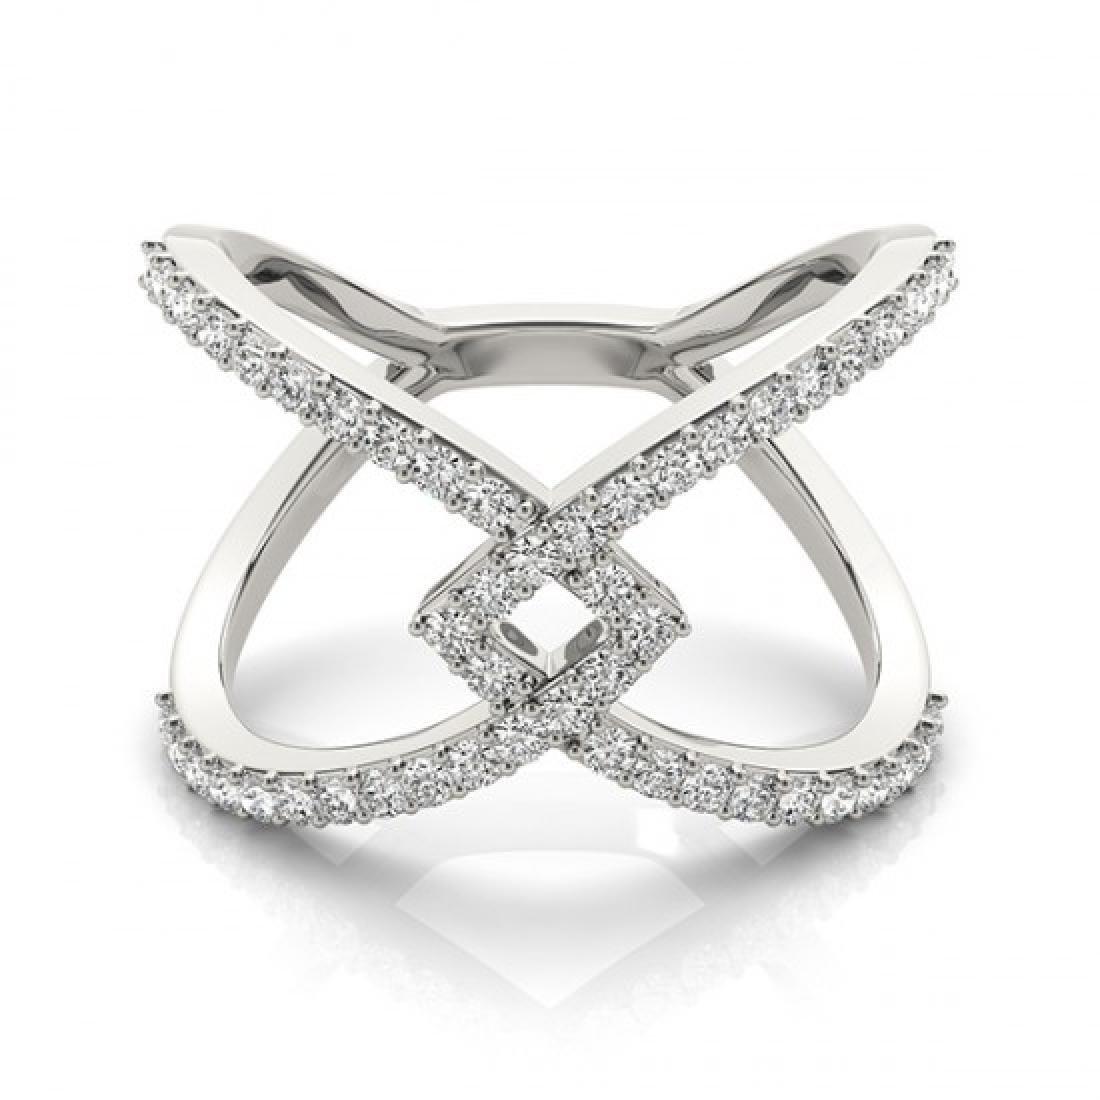 0.60 CTW Certified VS/SI Diamond Fashion Ring 14K White